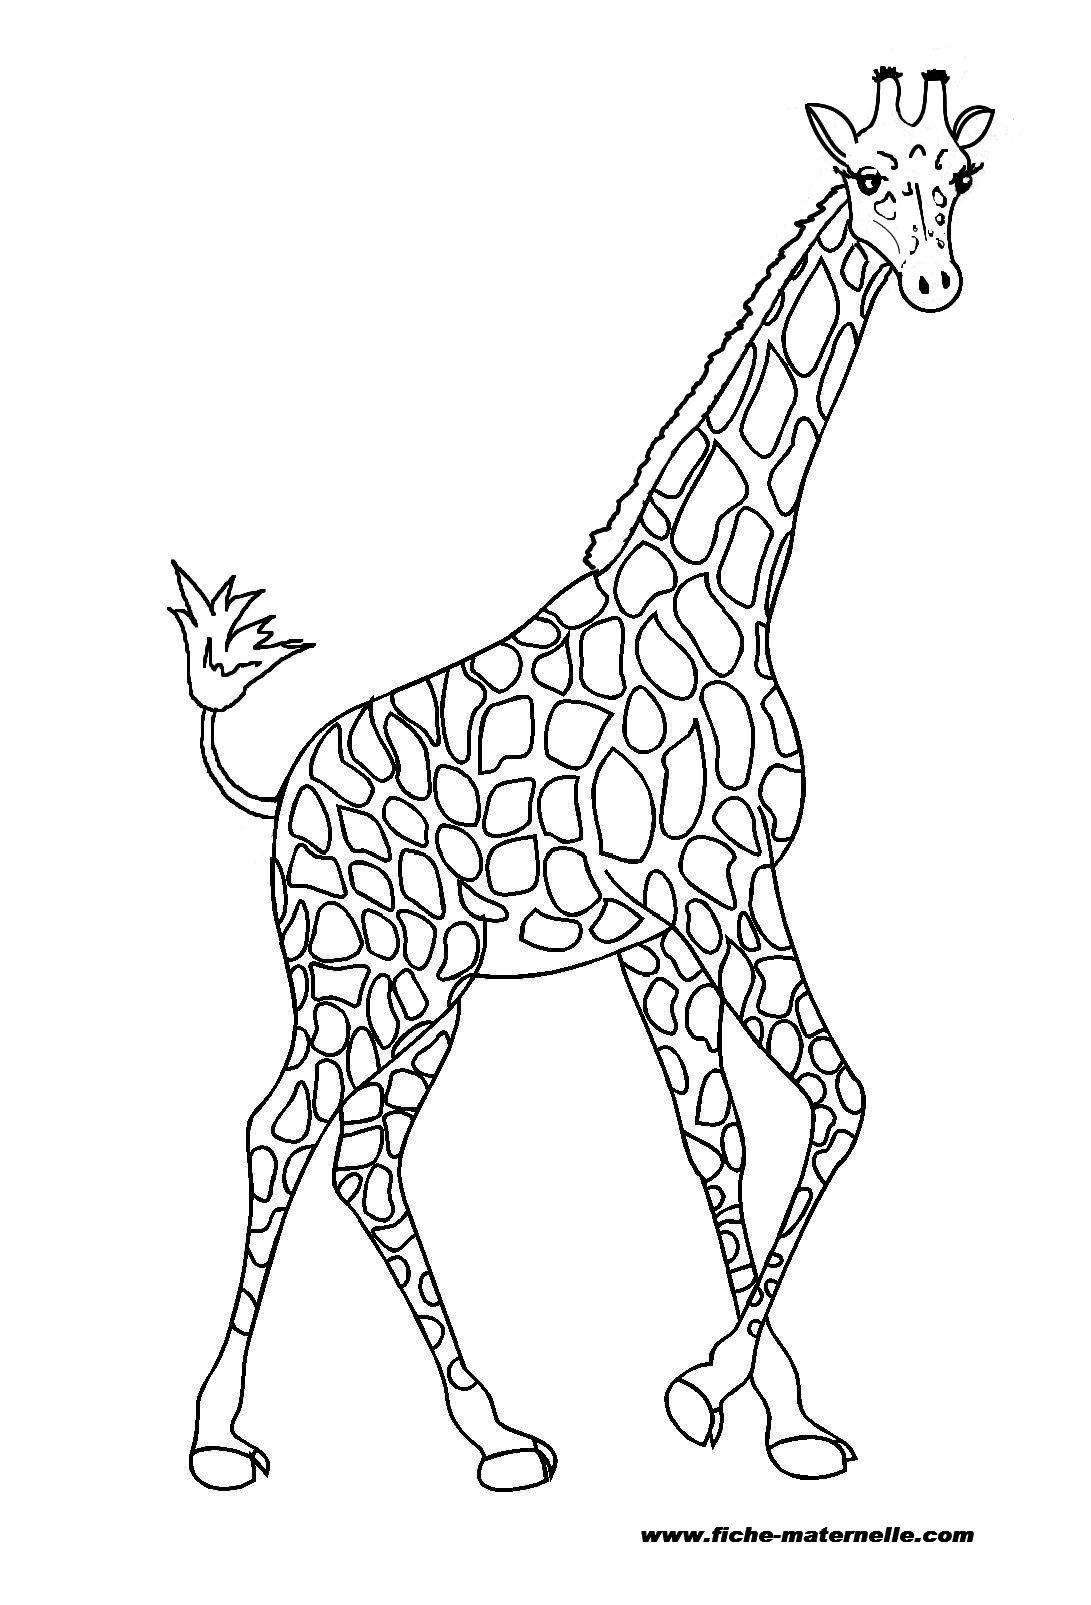 Extrêmement à imprimer : Animaux - Girafe numéro 754223 WM02